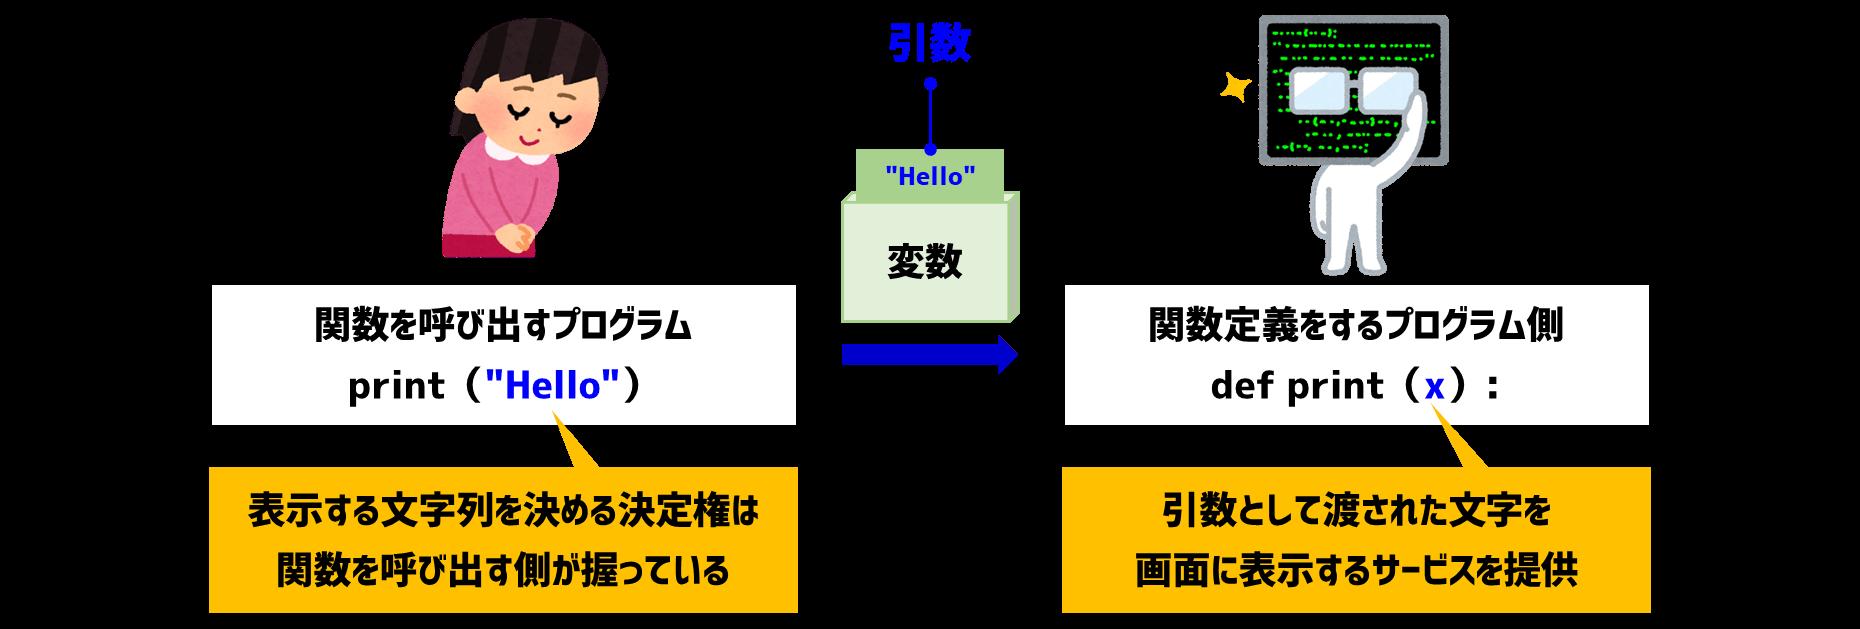 print関数の引数